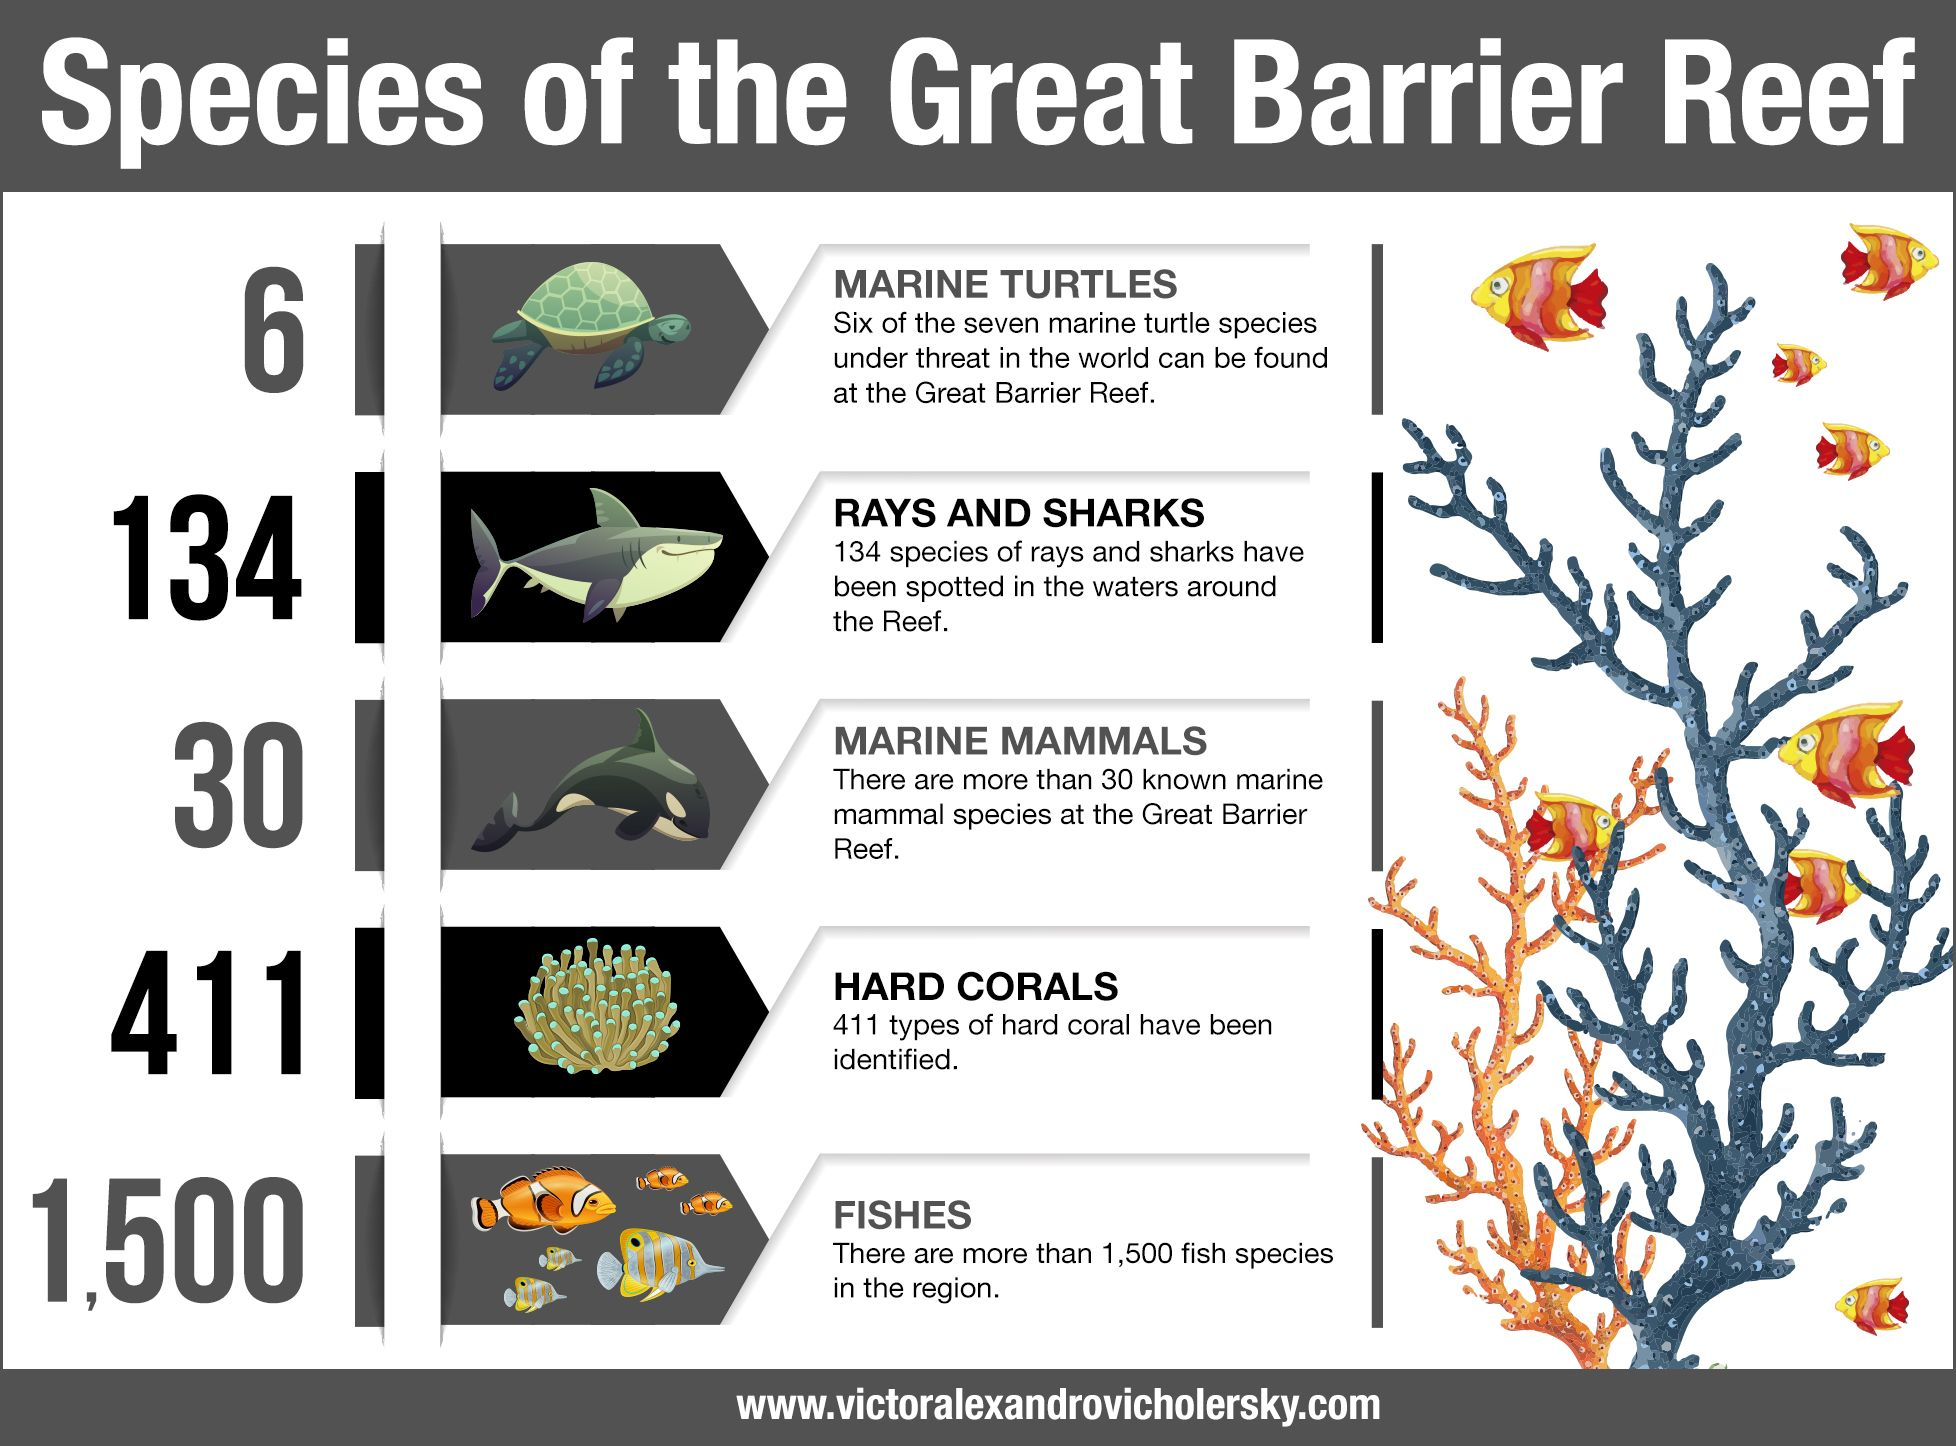 Species of the great barrier reef great barrier reef